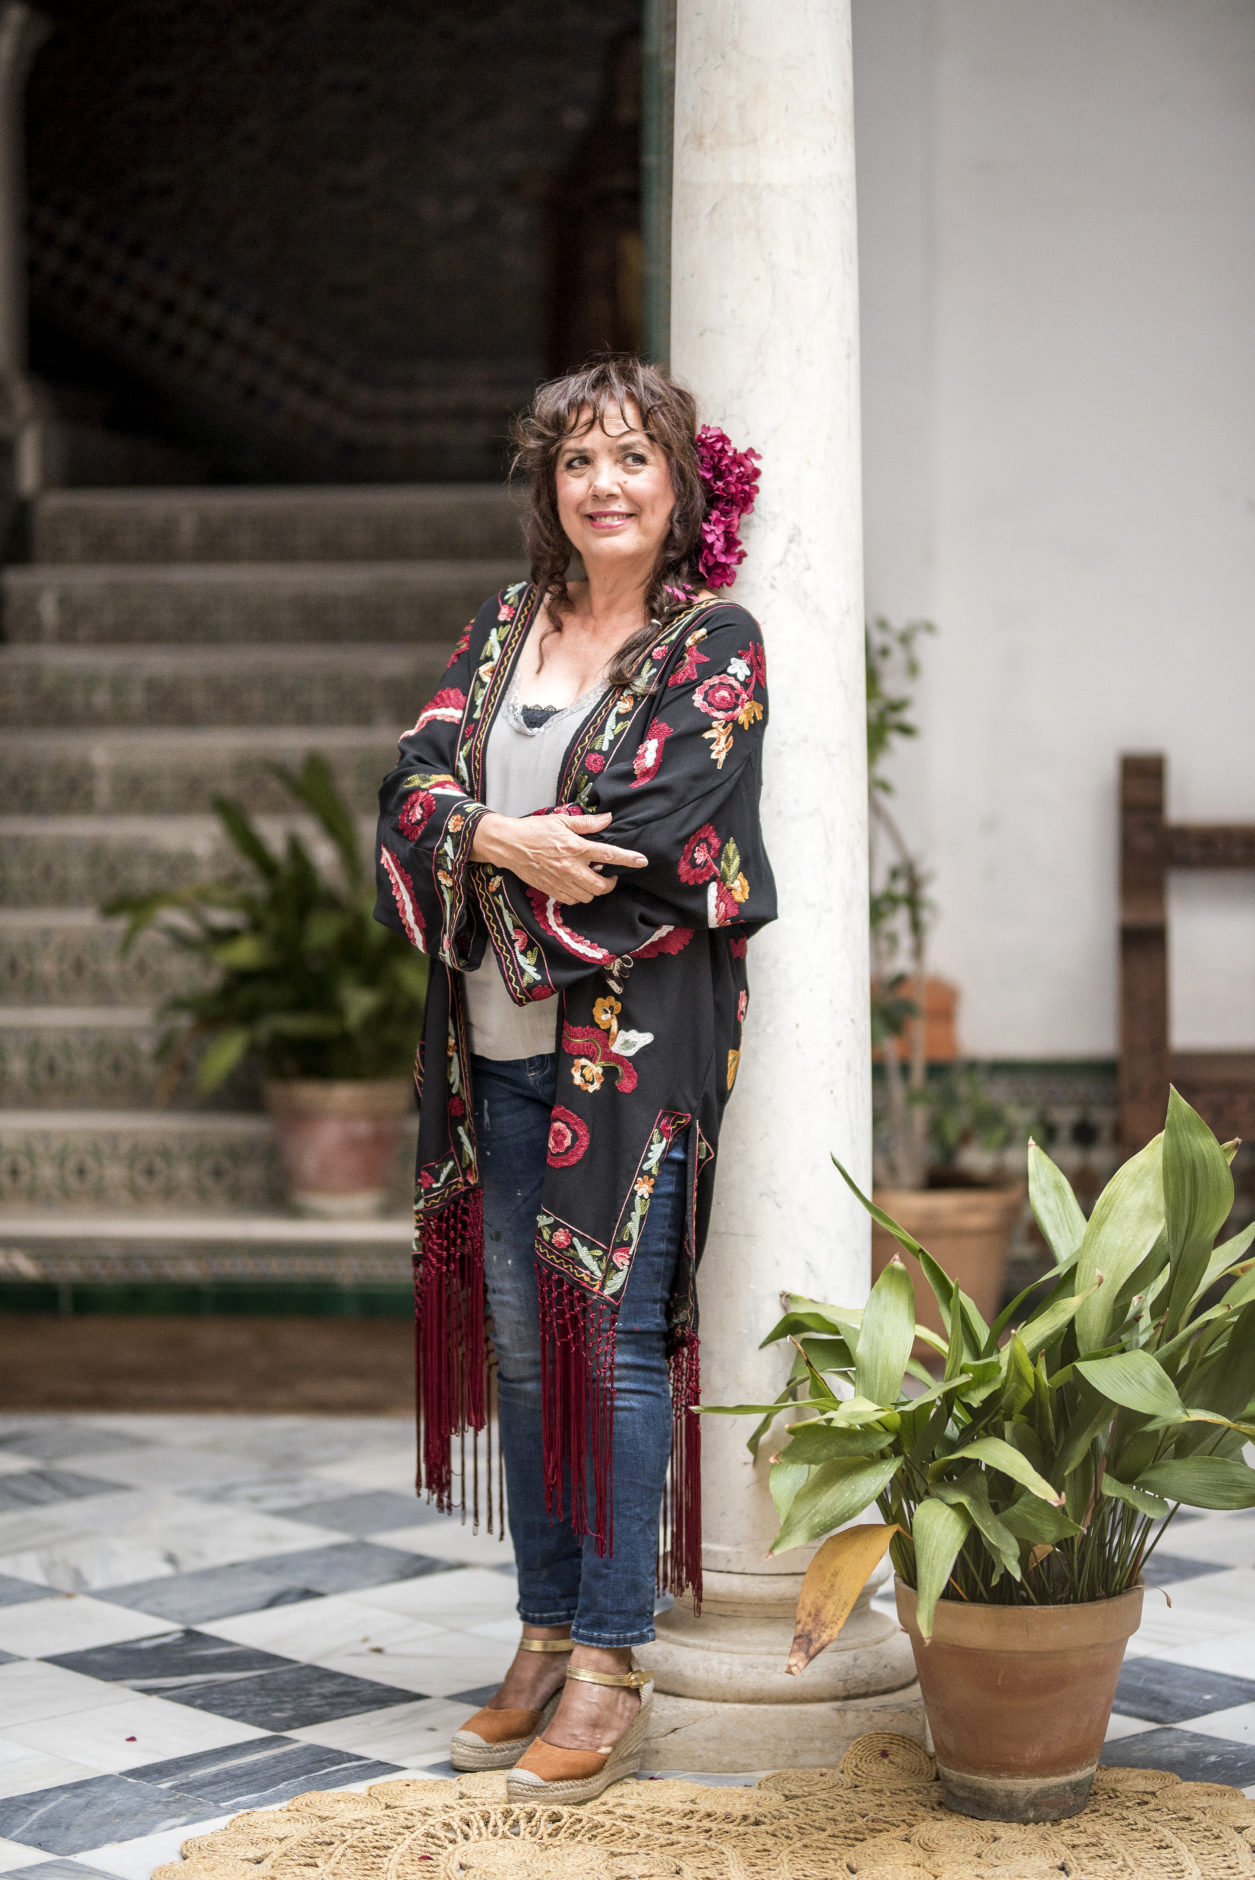 Mujeres cantan a lole - homenaje a lole montoya 2